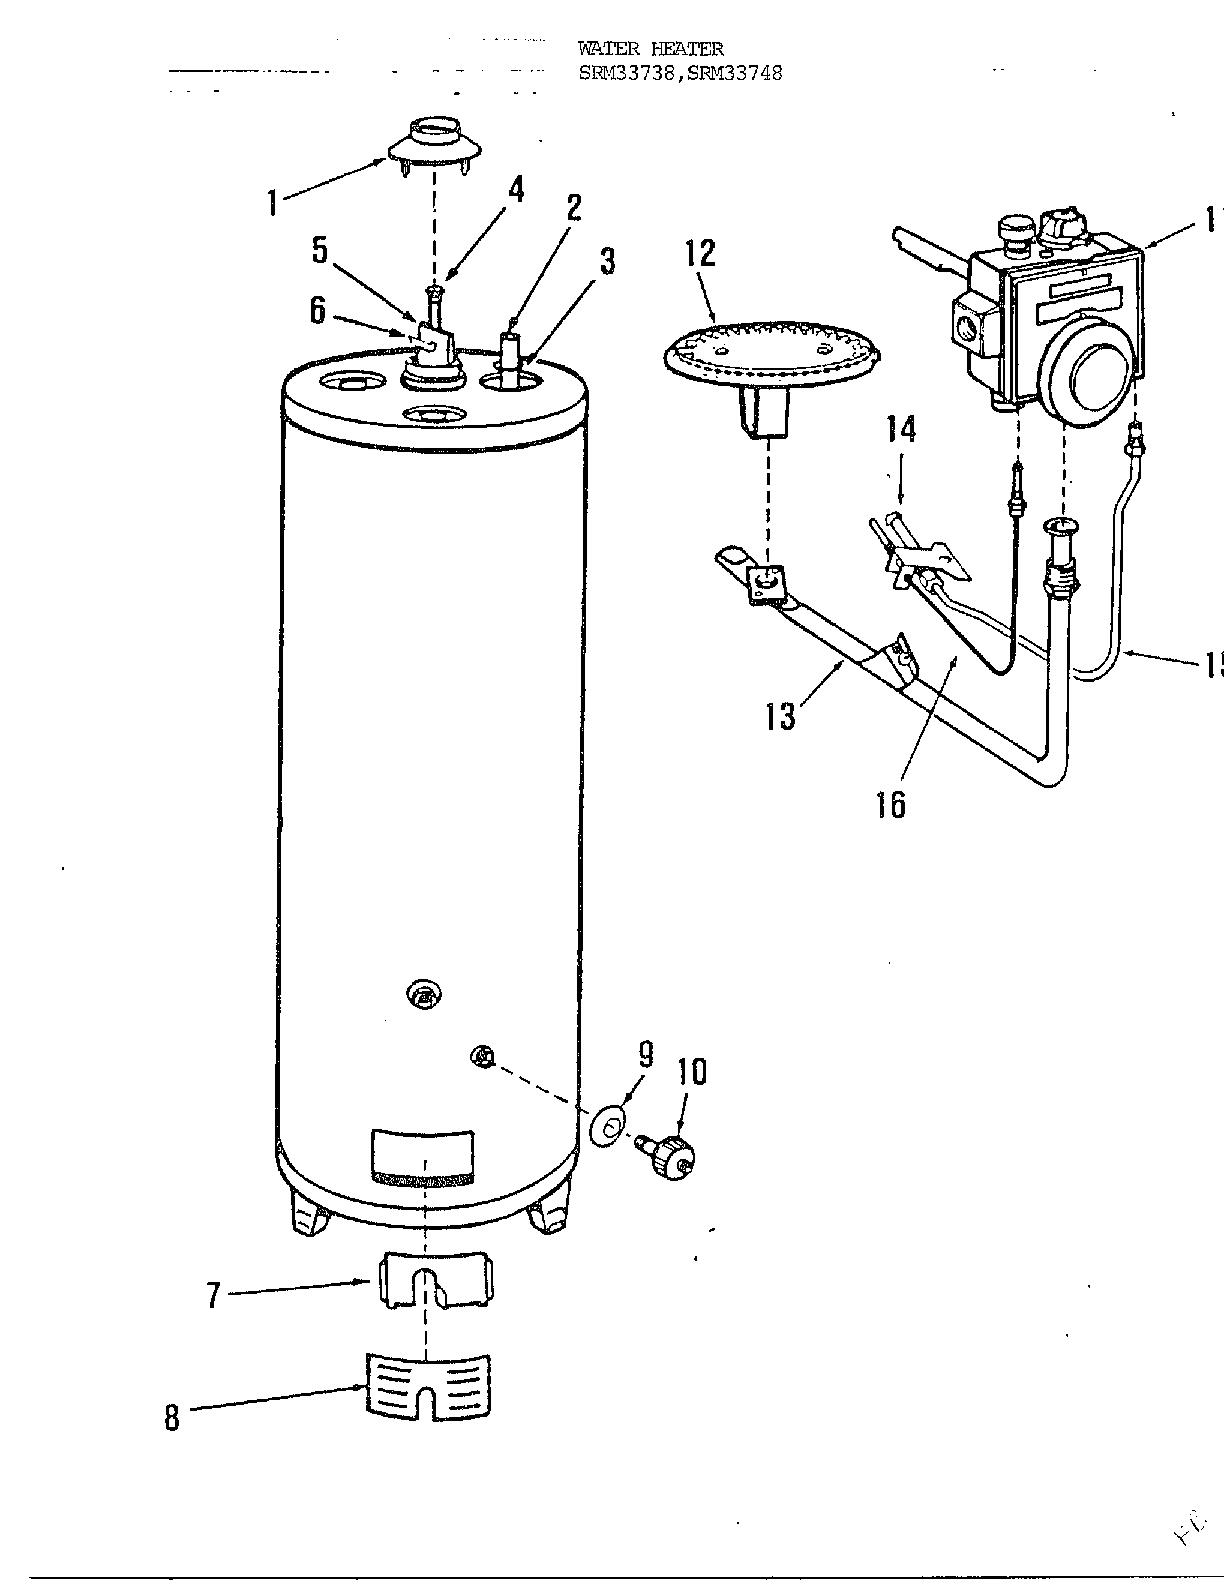 kenmore hot water heater wiring diagram mitsubishi triton radio general electric parts great installation of repair rheem rh heaterrepairhintomo blogspot com 60 gallon manual